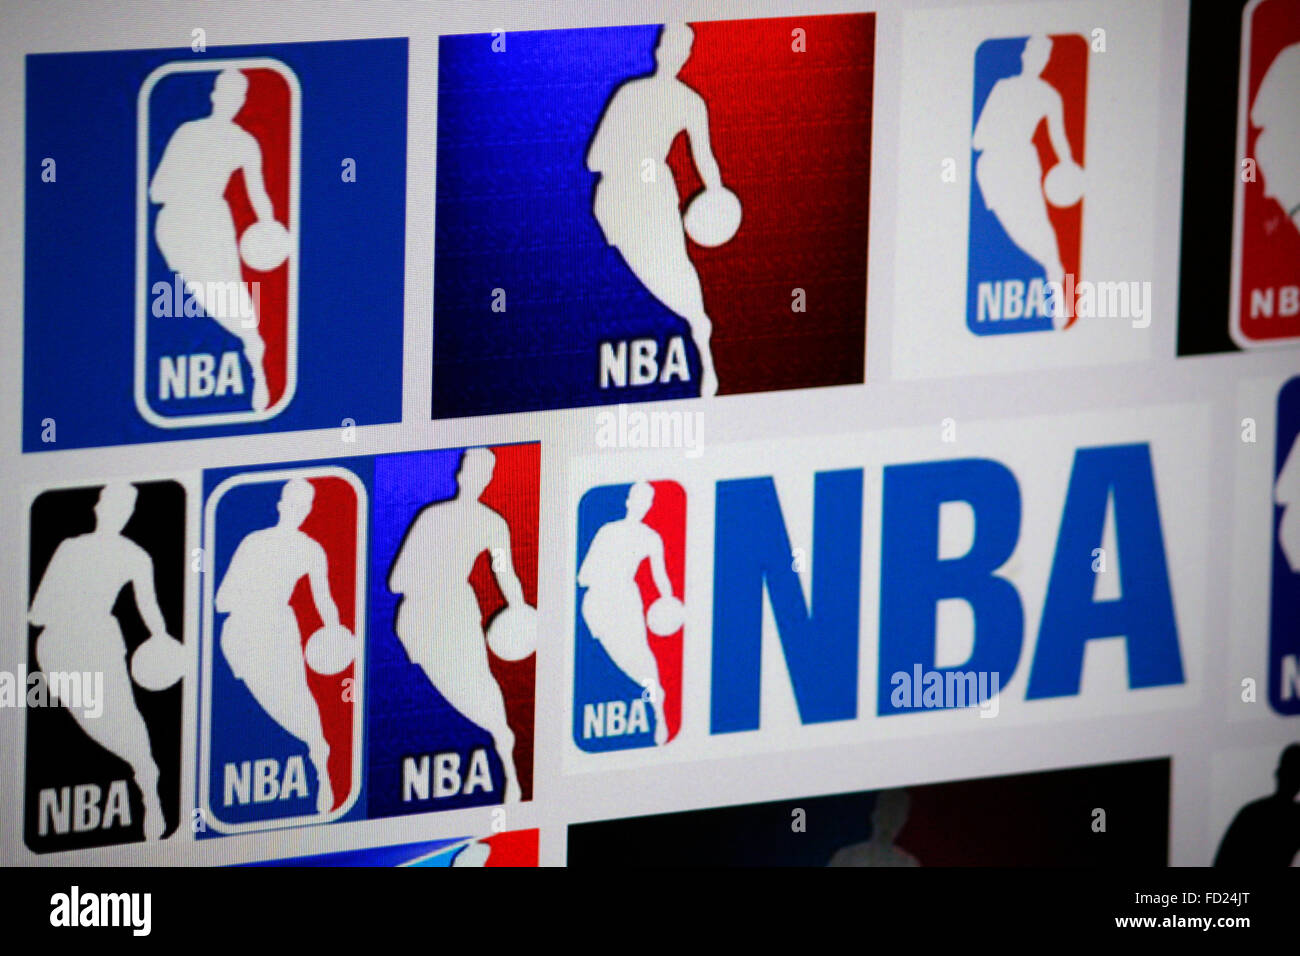 "Markenname: ""NBA-National Basketball Association"", Berlin. Stockfoto"